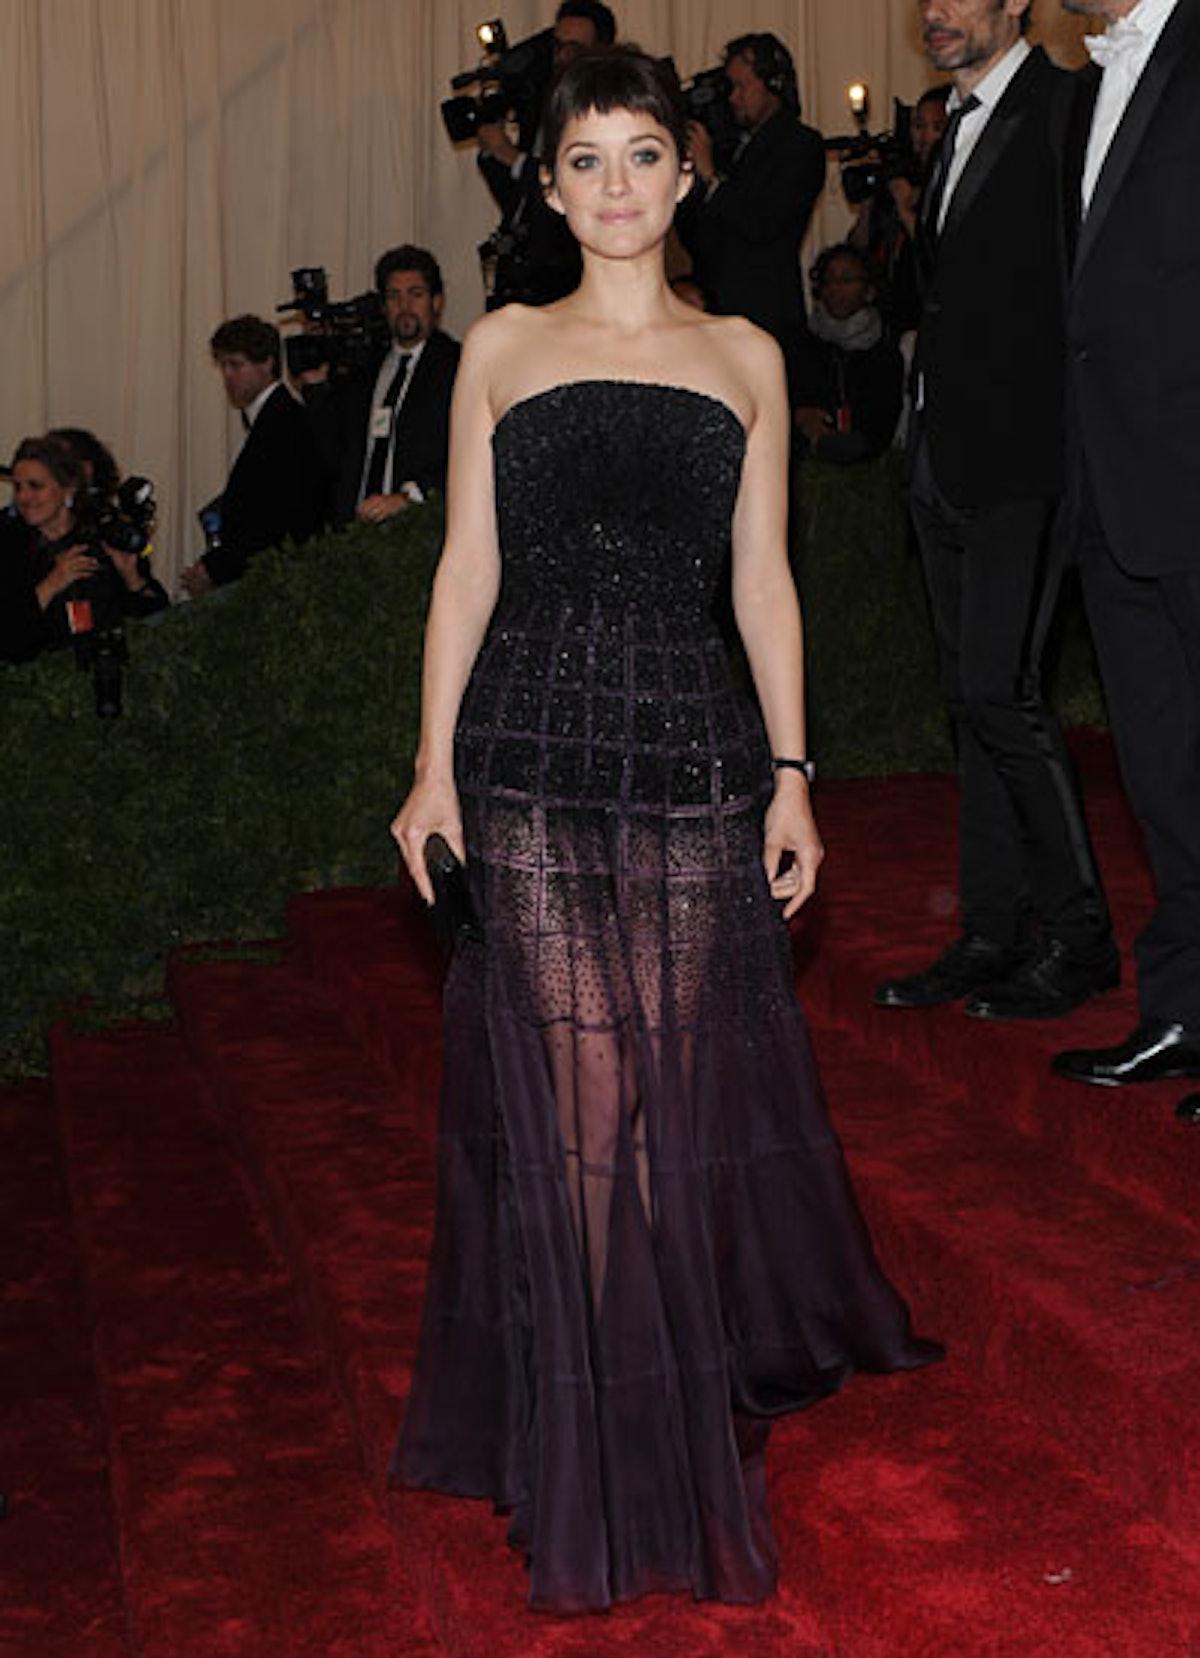 cess-marion-cotillard-best-red-carpet-looks-15-v.jpg